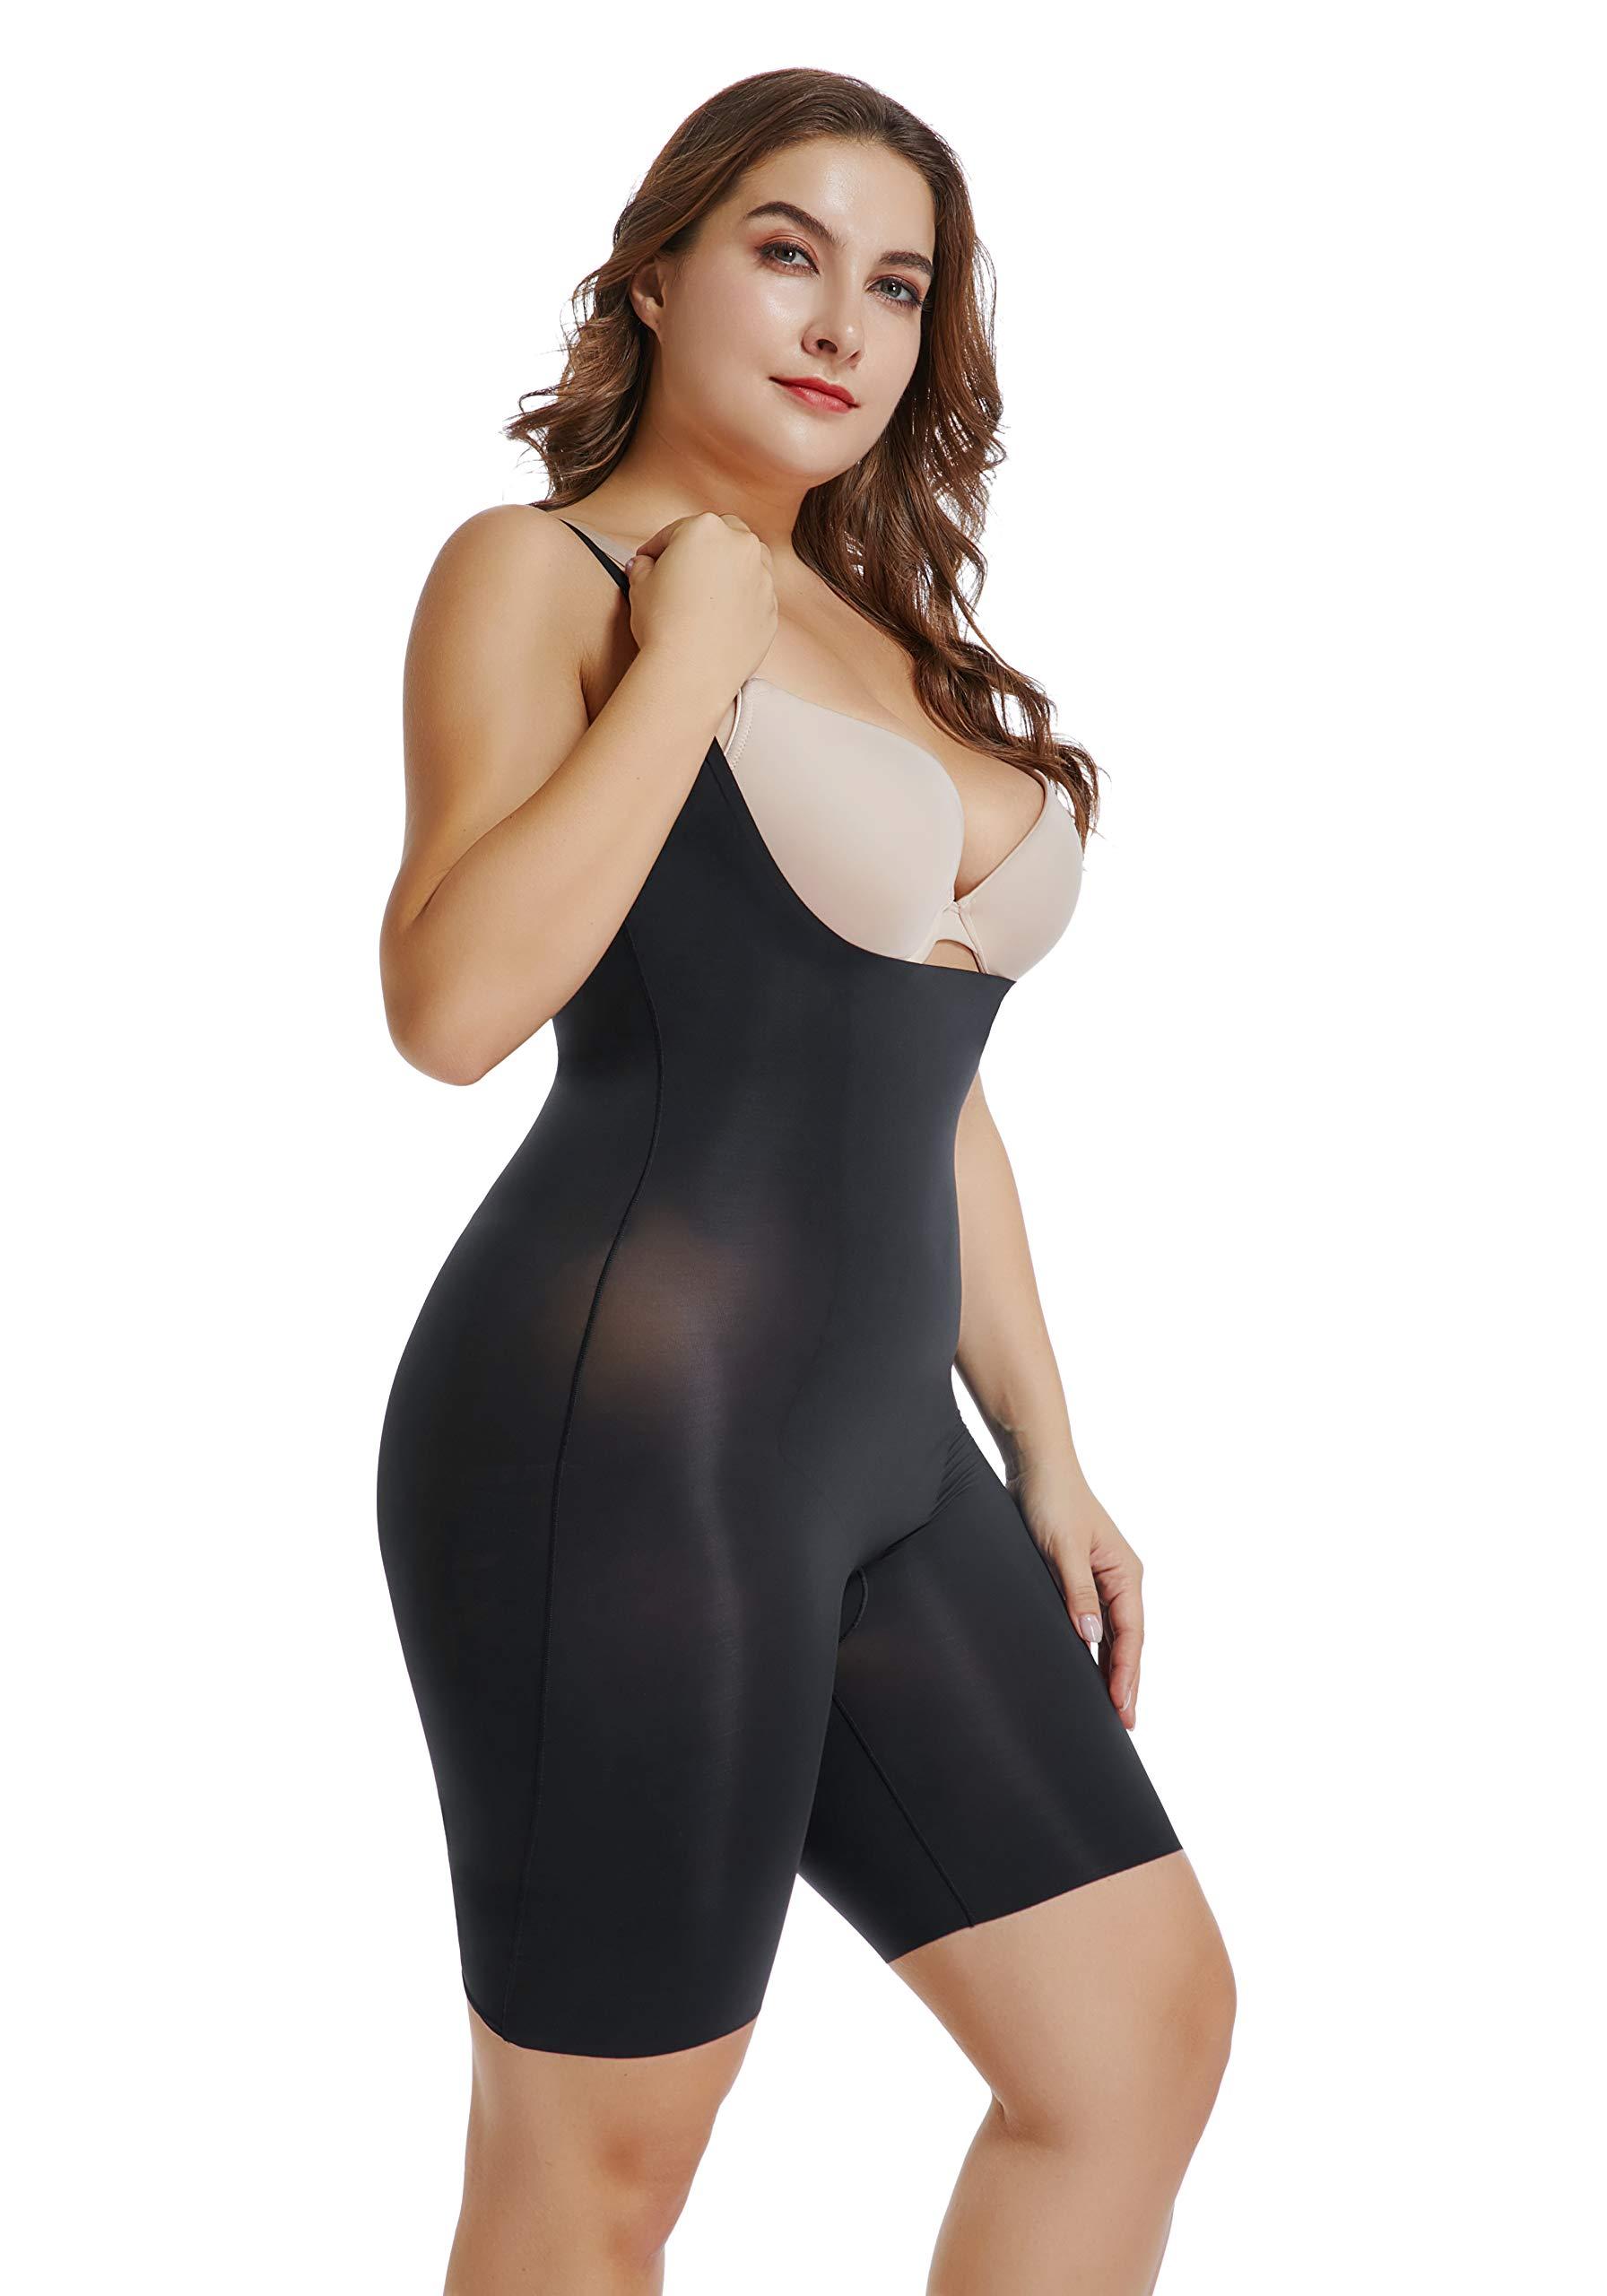 Joyshaper Thin Slimming Bodysuit High Waist Full Body Shaper Open Bust Tummy Control Shapewear for Women Plus Size